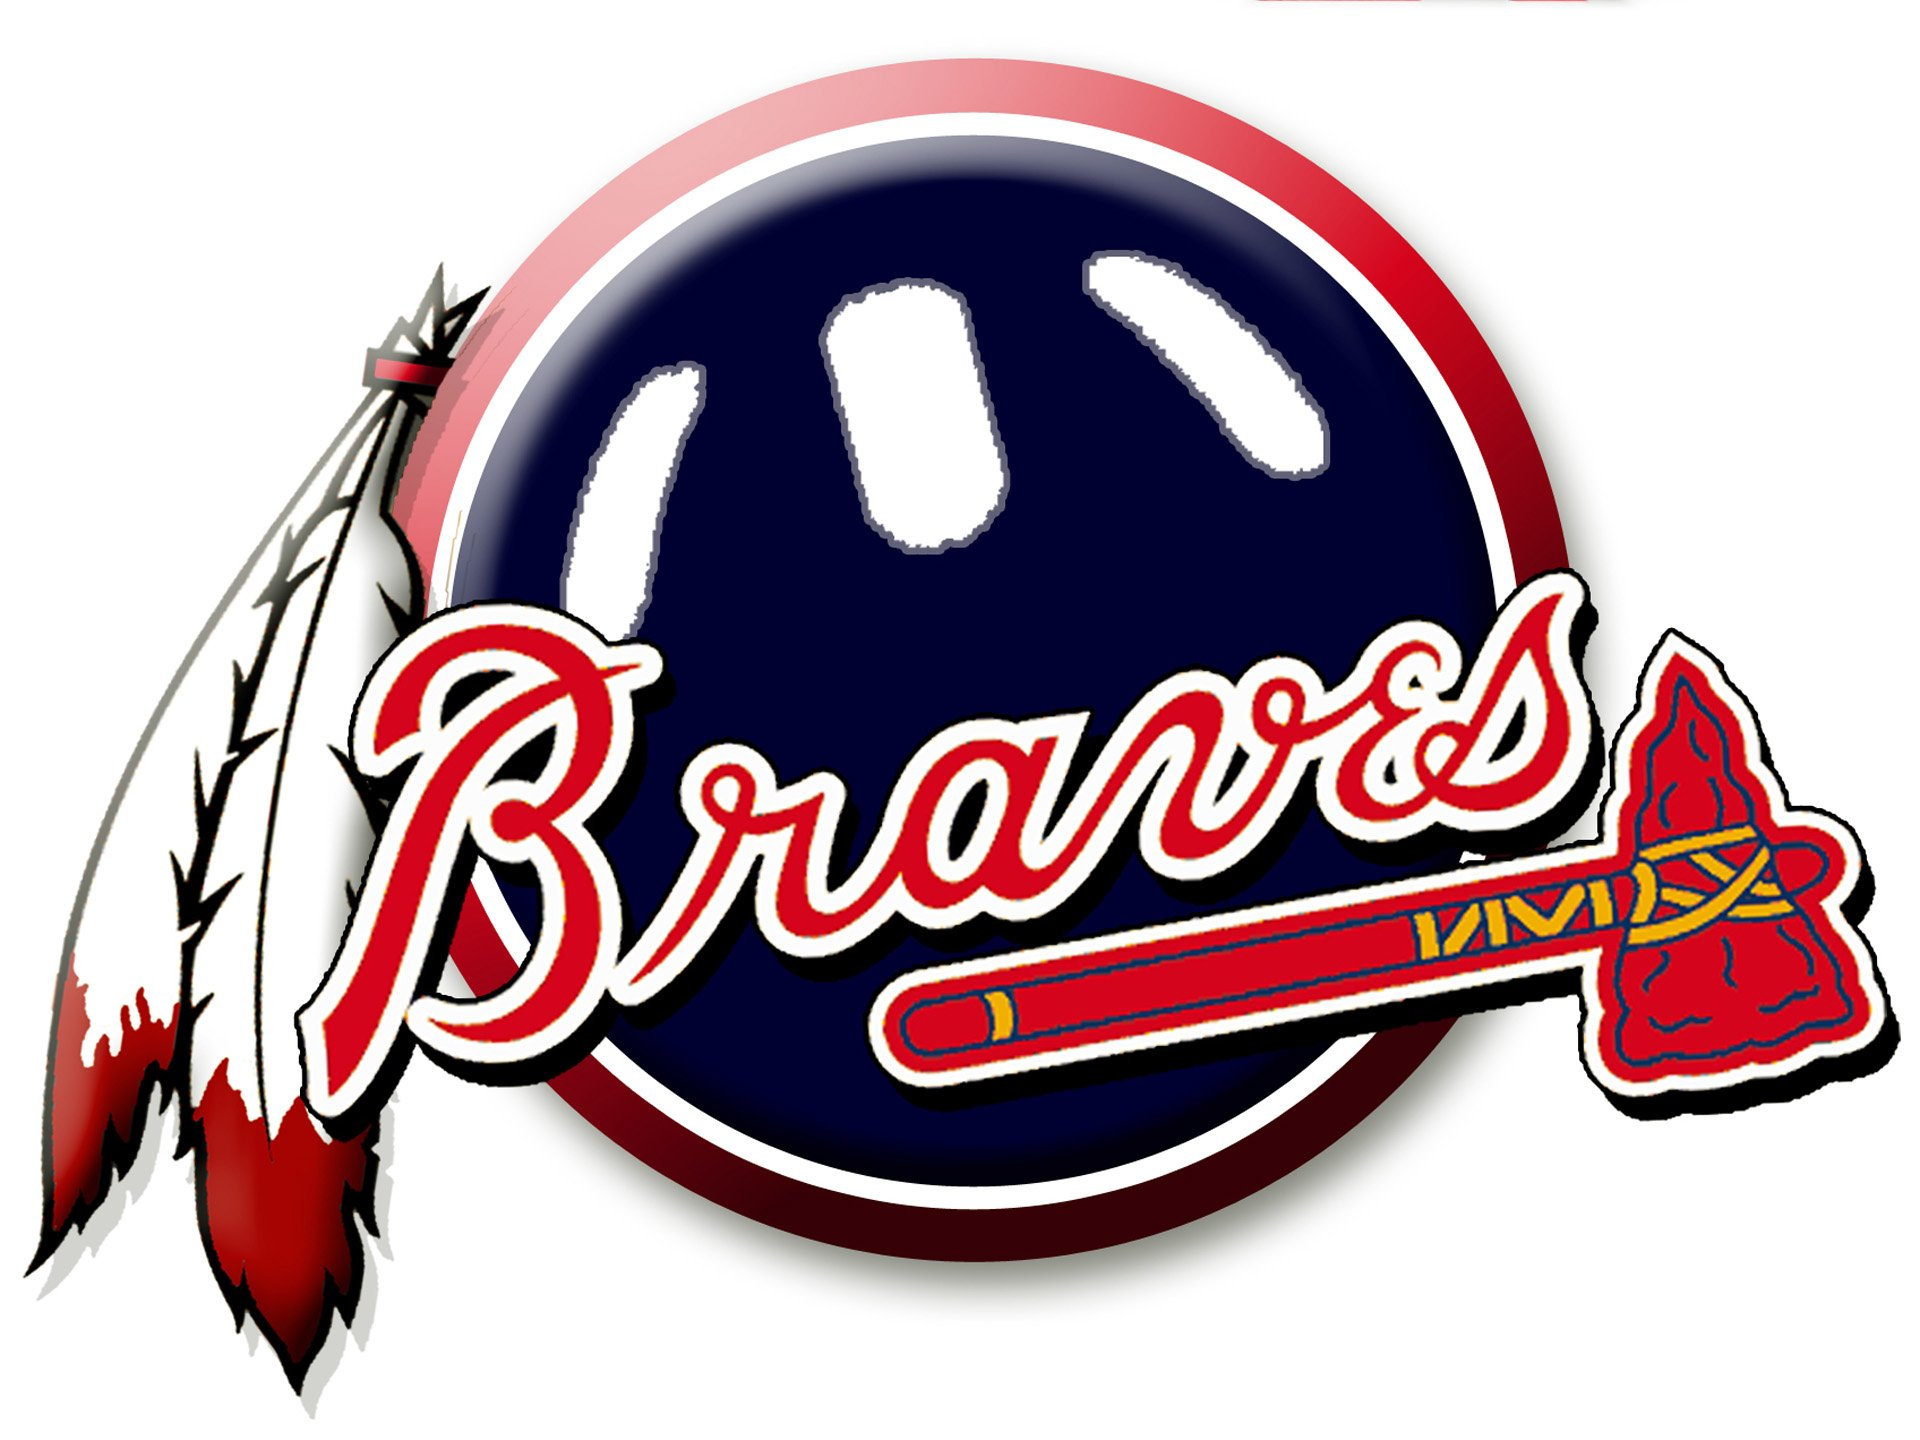 Atlanta Braves Wallpapers 62 Images: Atlanta Braves Wallpaper For IPad